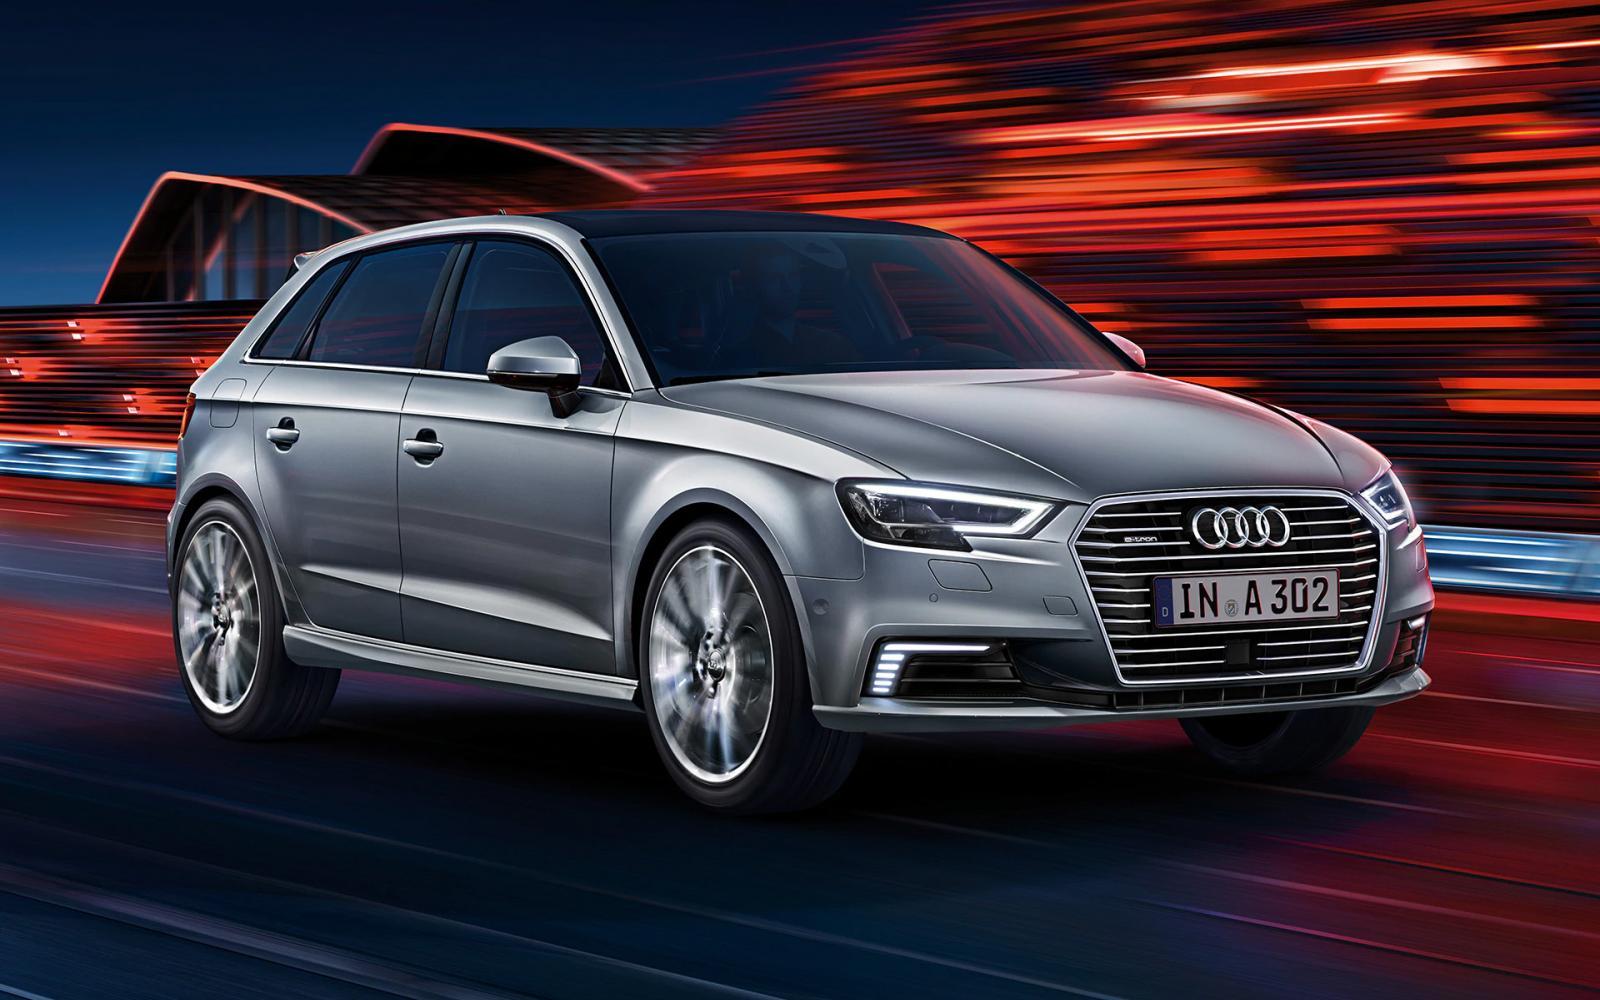 Kelebihan Audi A3 Etron Murah Berkualitas